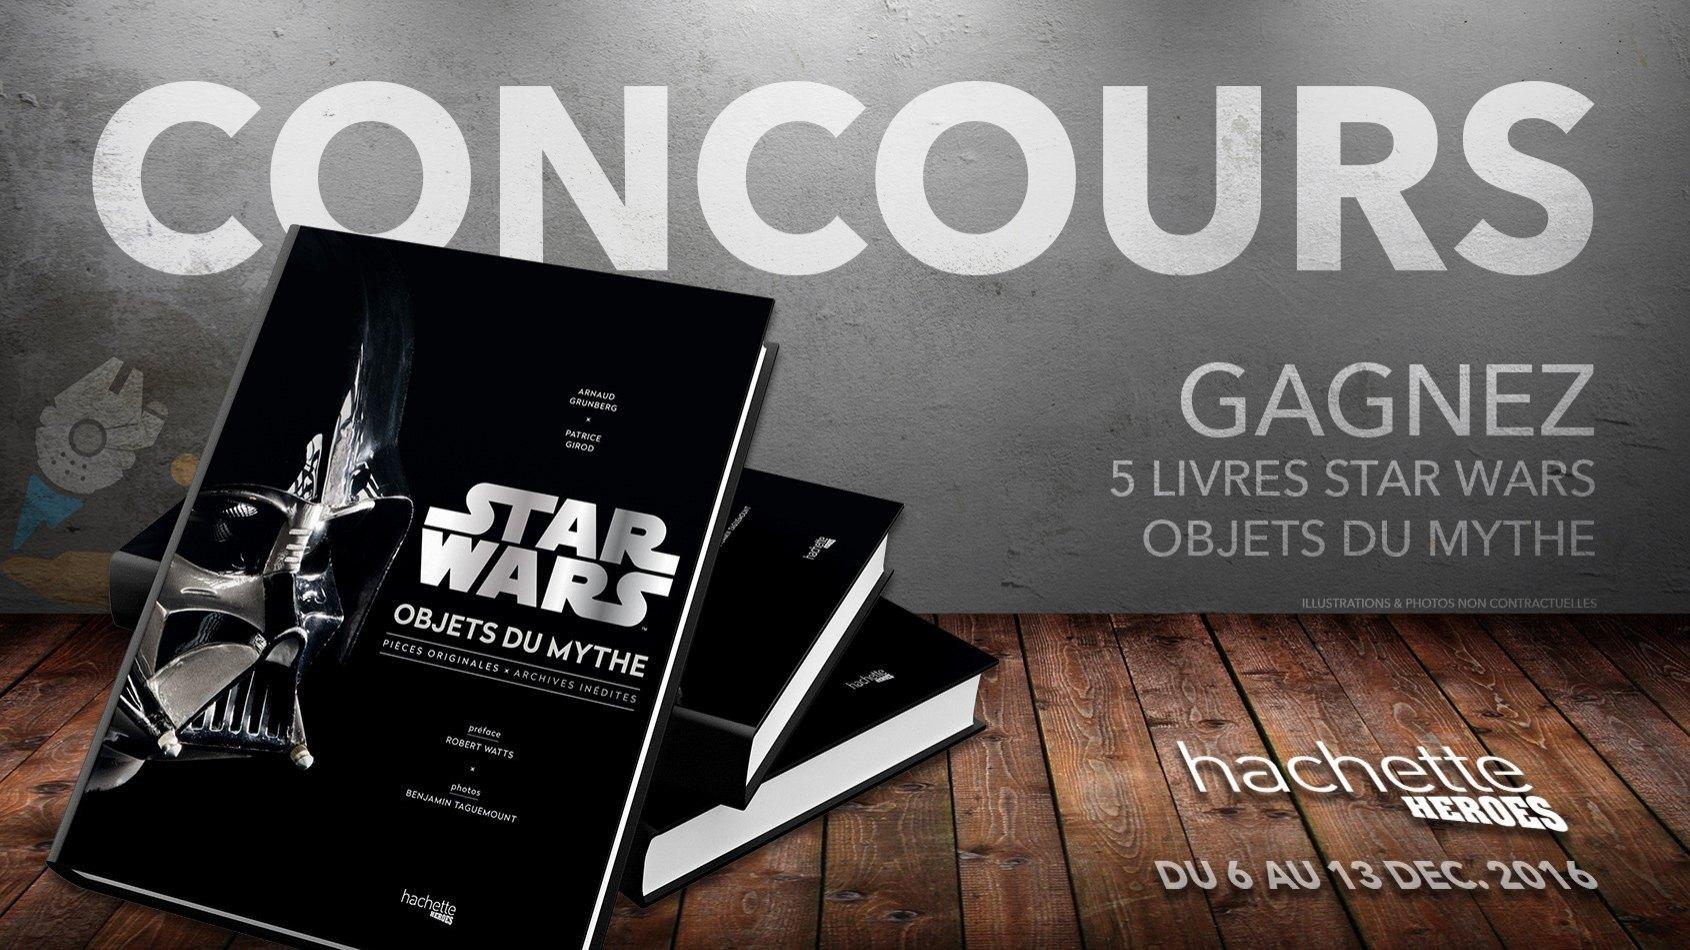 Concours : Gagnez 5 livres Star Wars Objets du Mythe